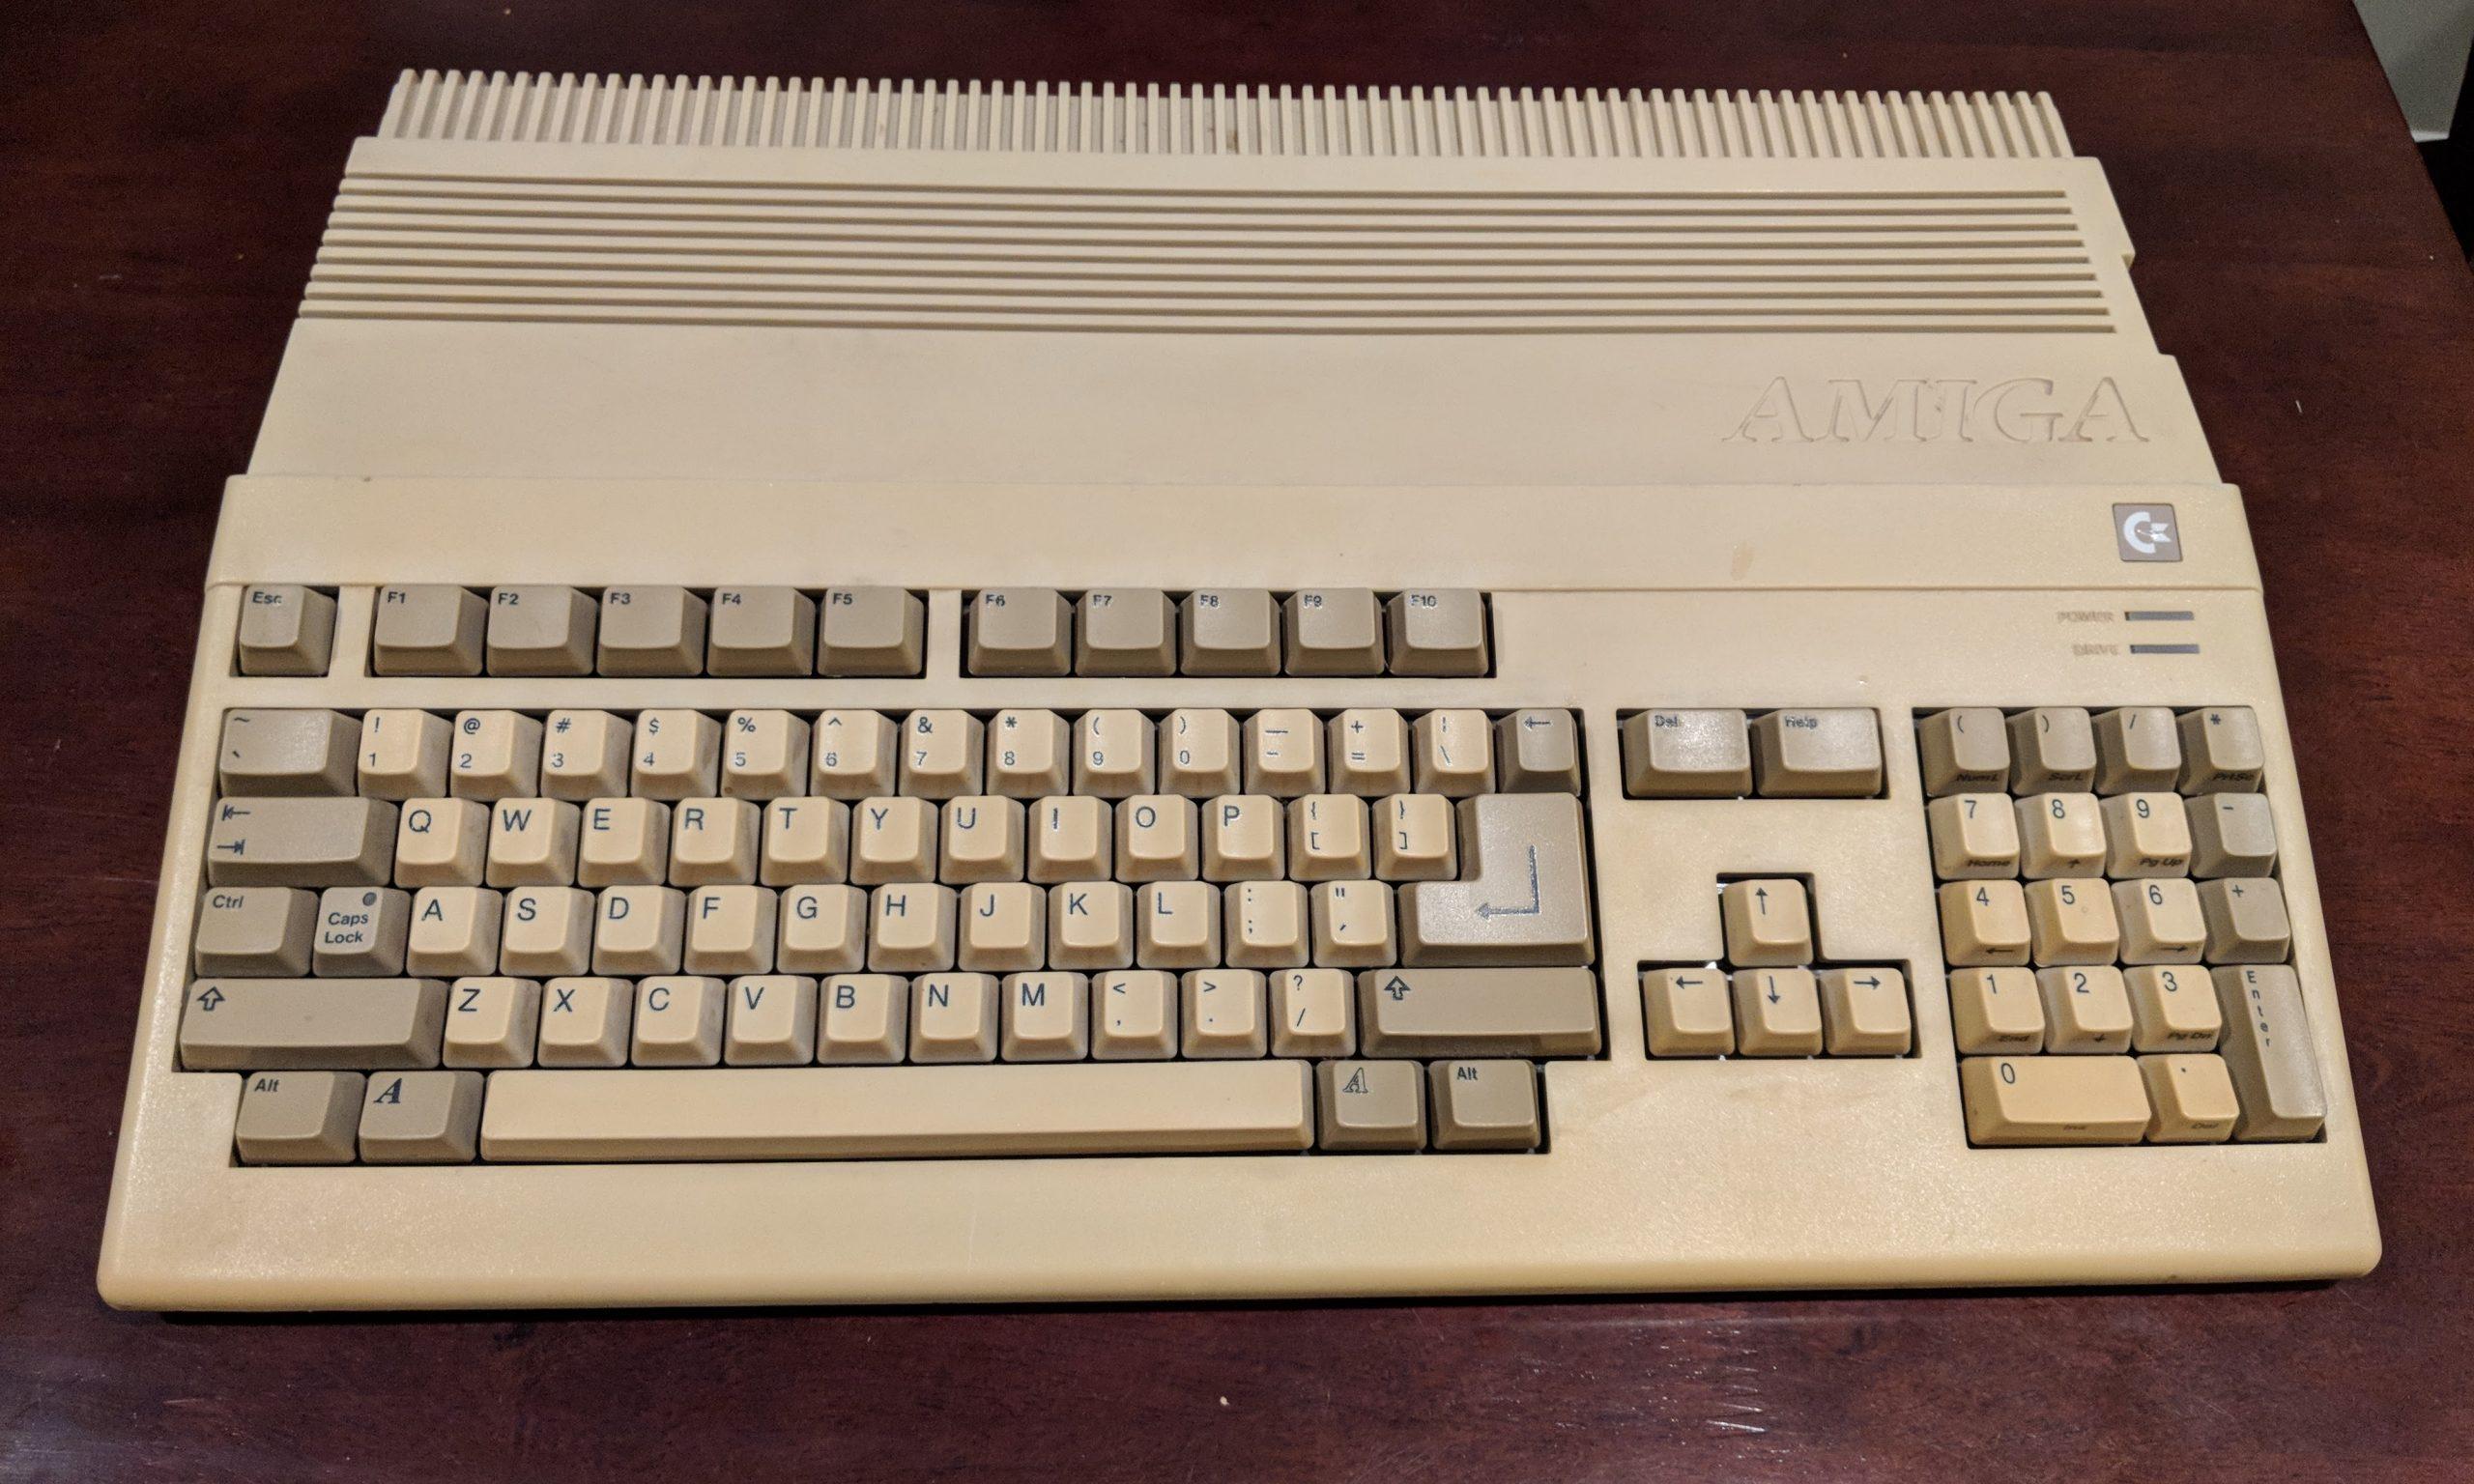 Commodore Amiga 500, disconnected